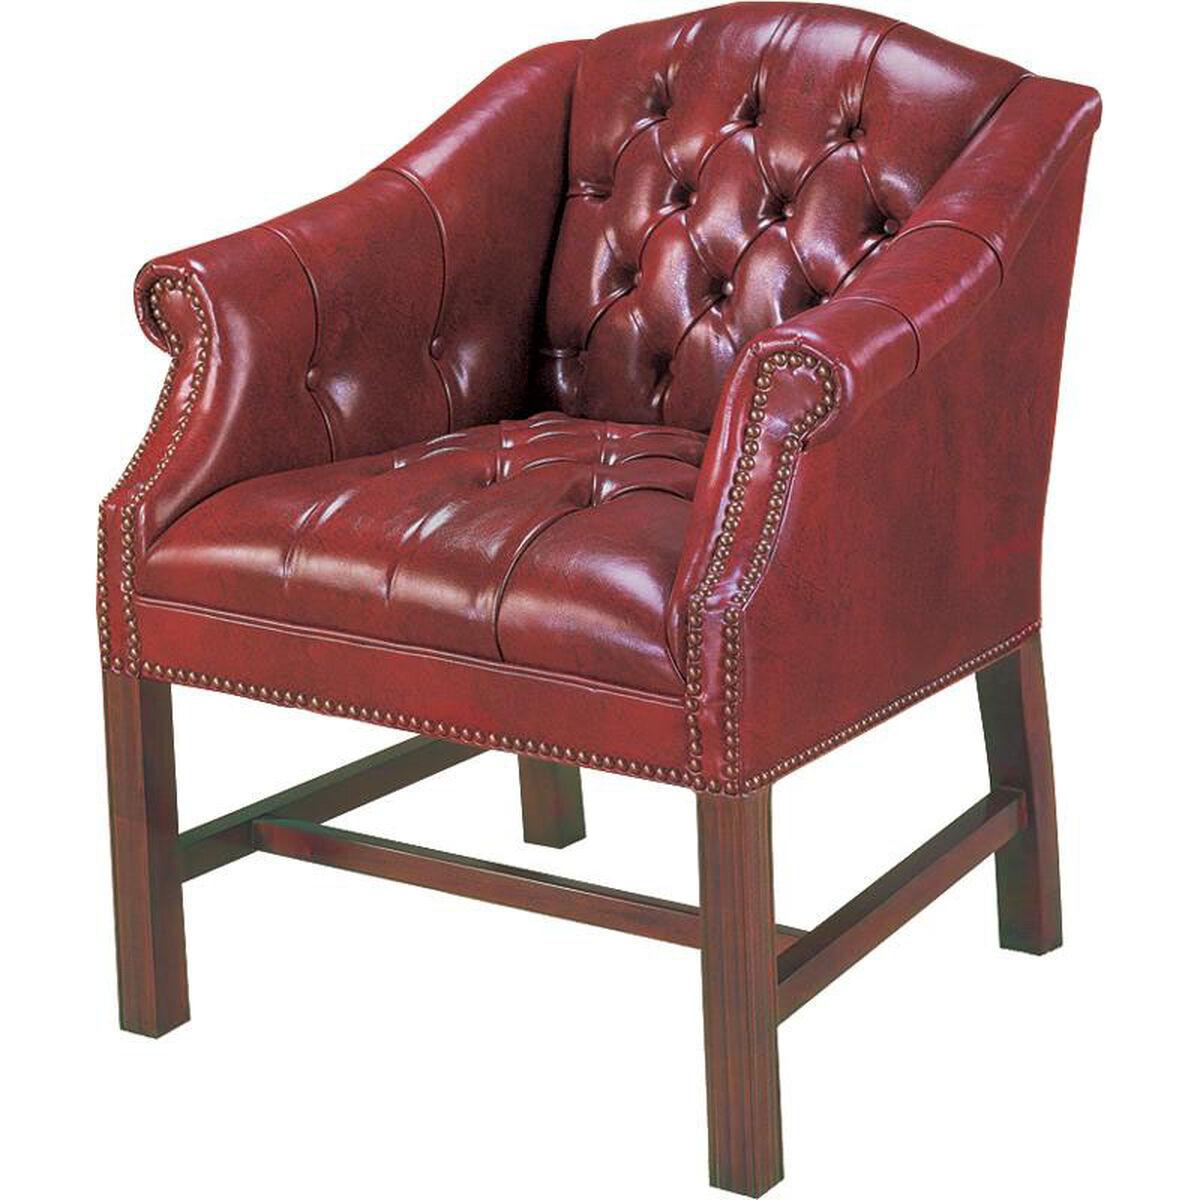 High Point Furniture Industries 4075 Hpf 4075